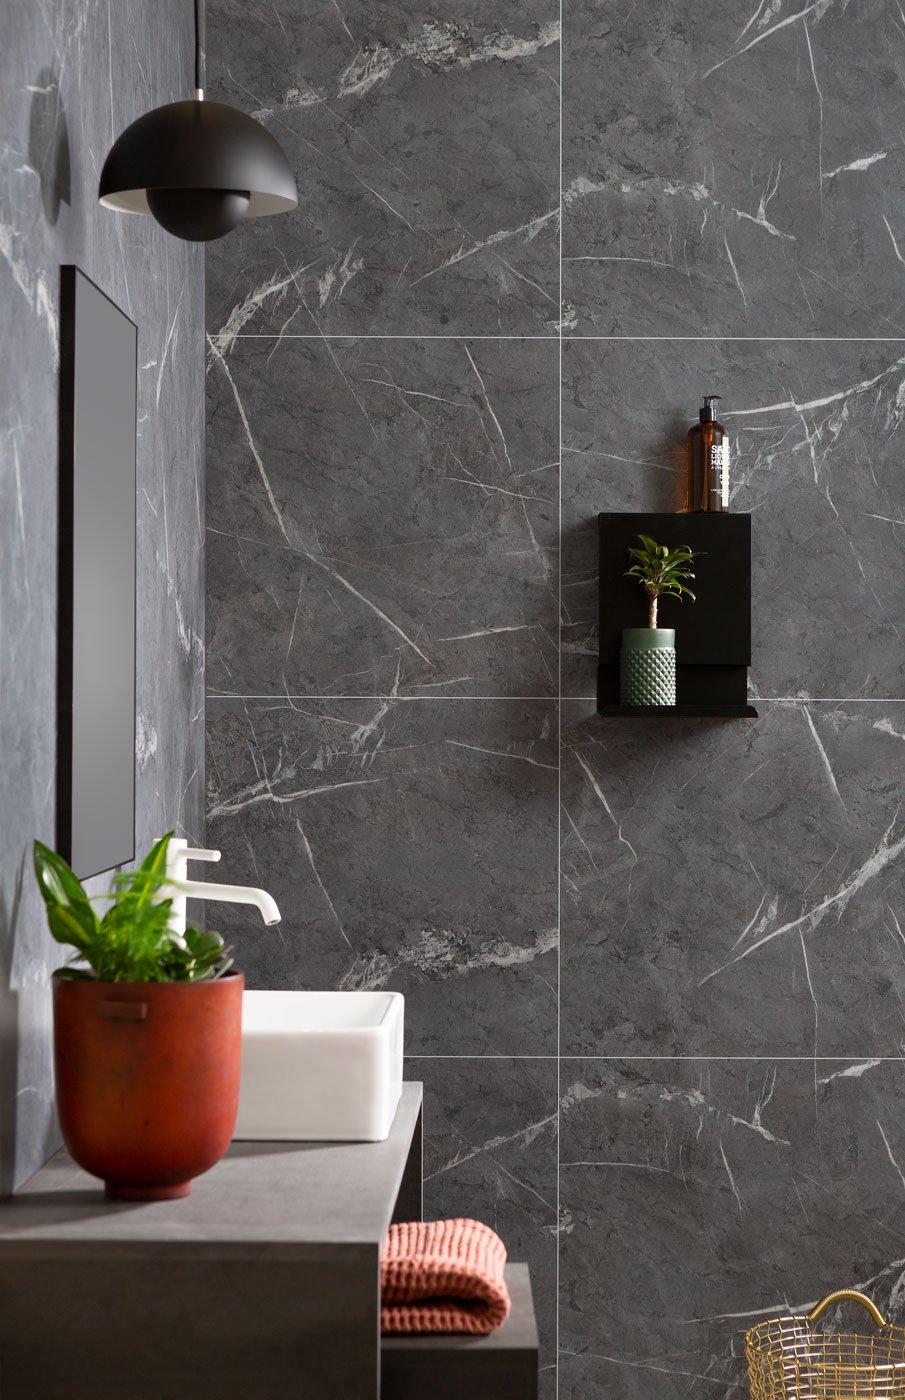 Statement splashback with grey marble